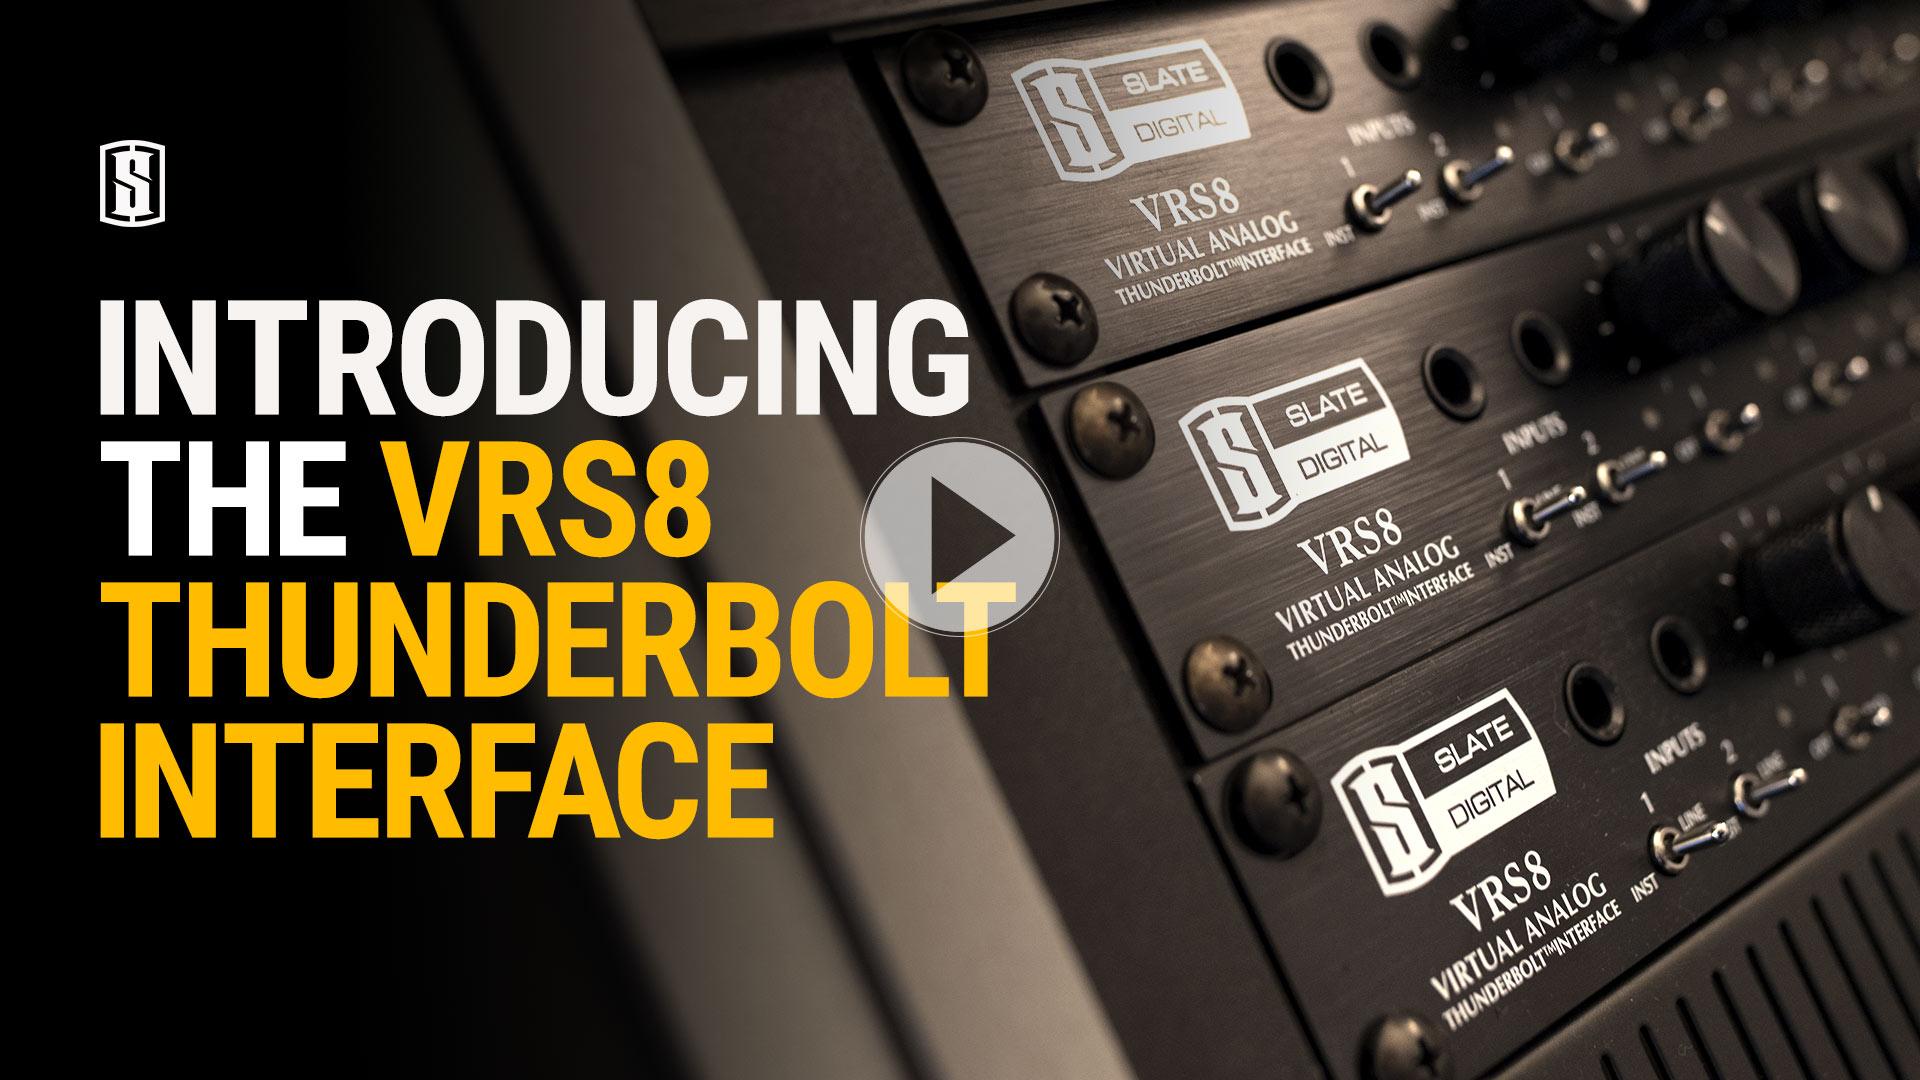 Vrs8 Slatedigital Digital Audio Platform Create A Virtual Recording Bundle